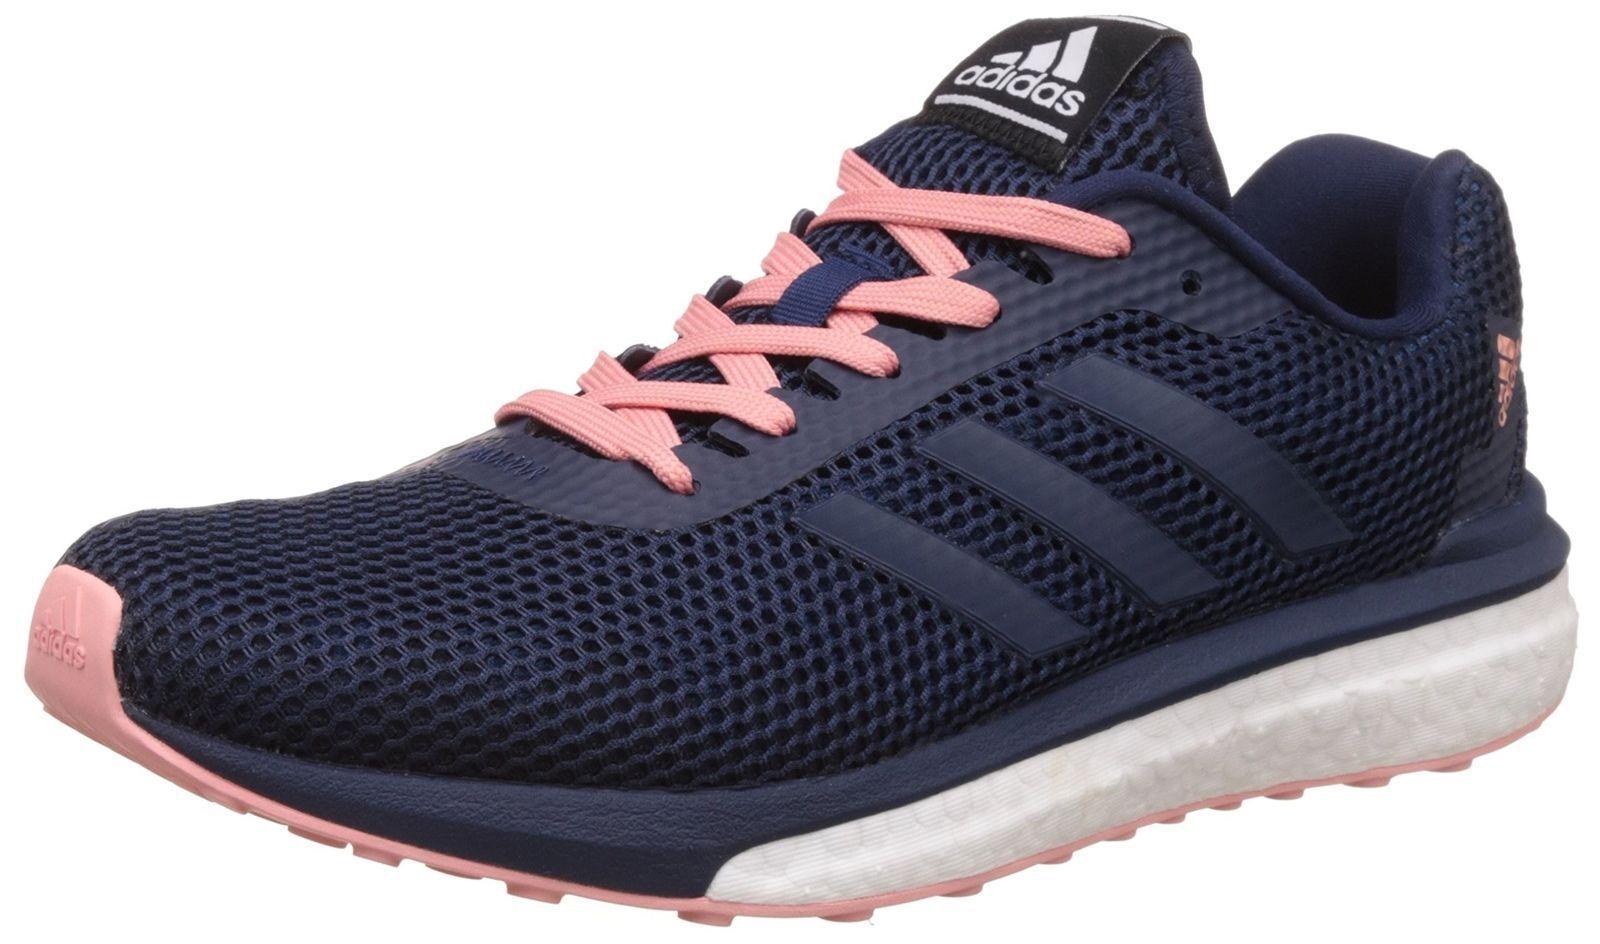 Adidas Boost vengeur pour femme UK 5 EU 38 Bleu Marine Rose Chaussures De Course Baskets BB1637